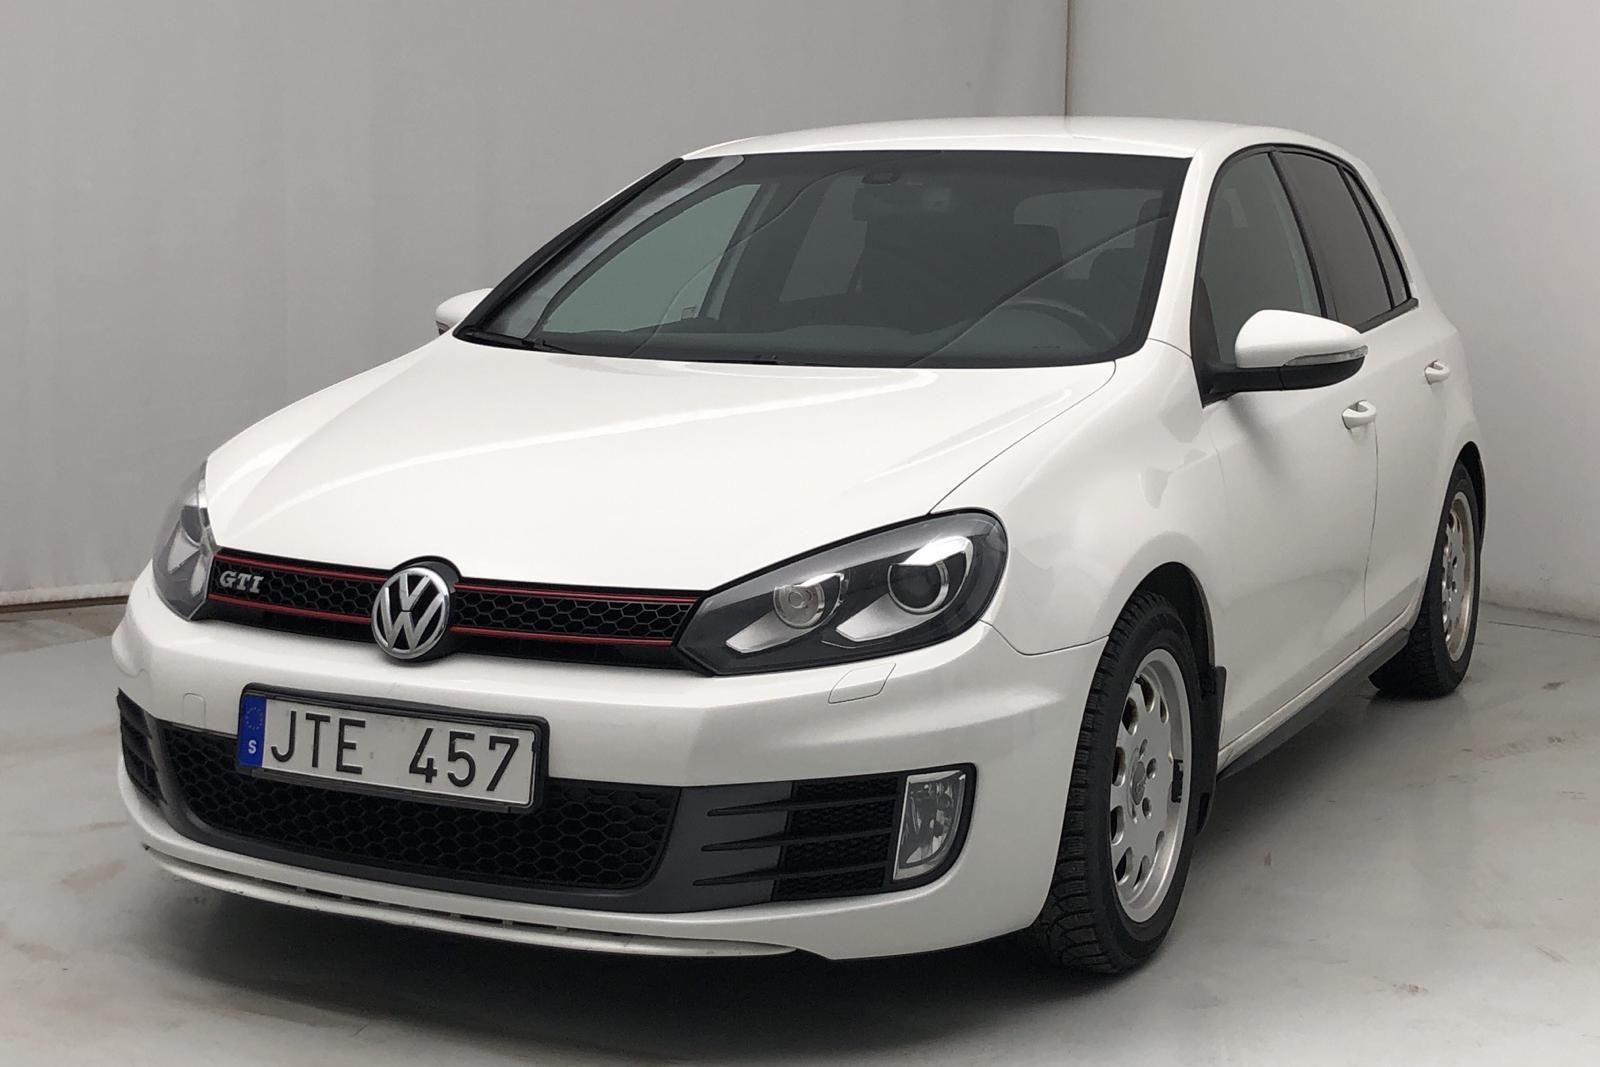 VW Golf VI GTI 2.0 TSI 5dr (211hk)